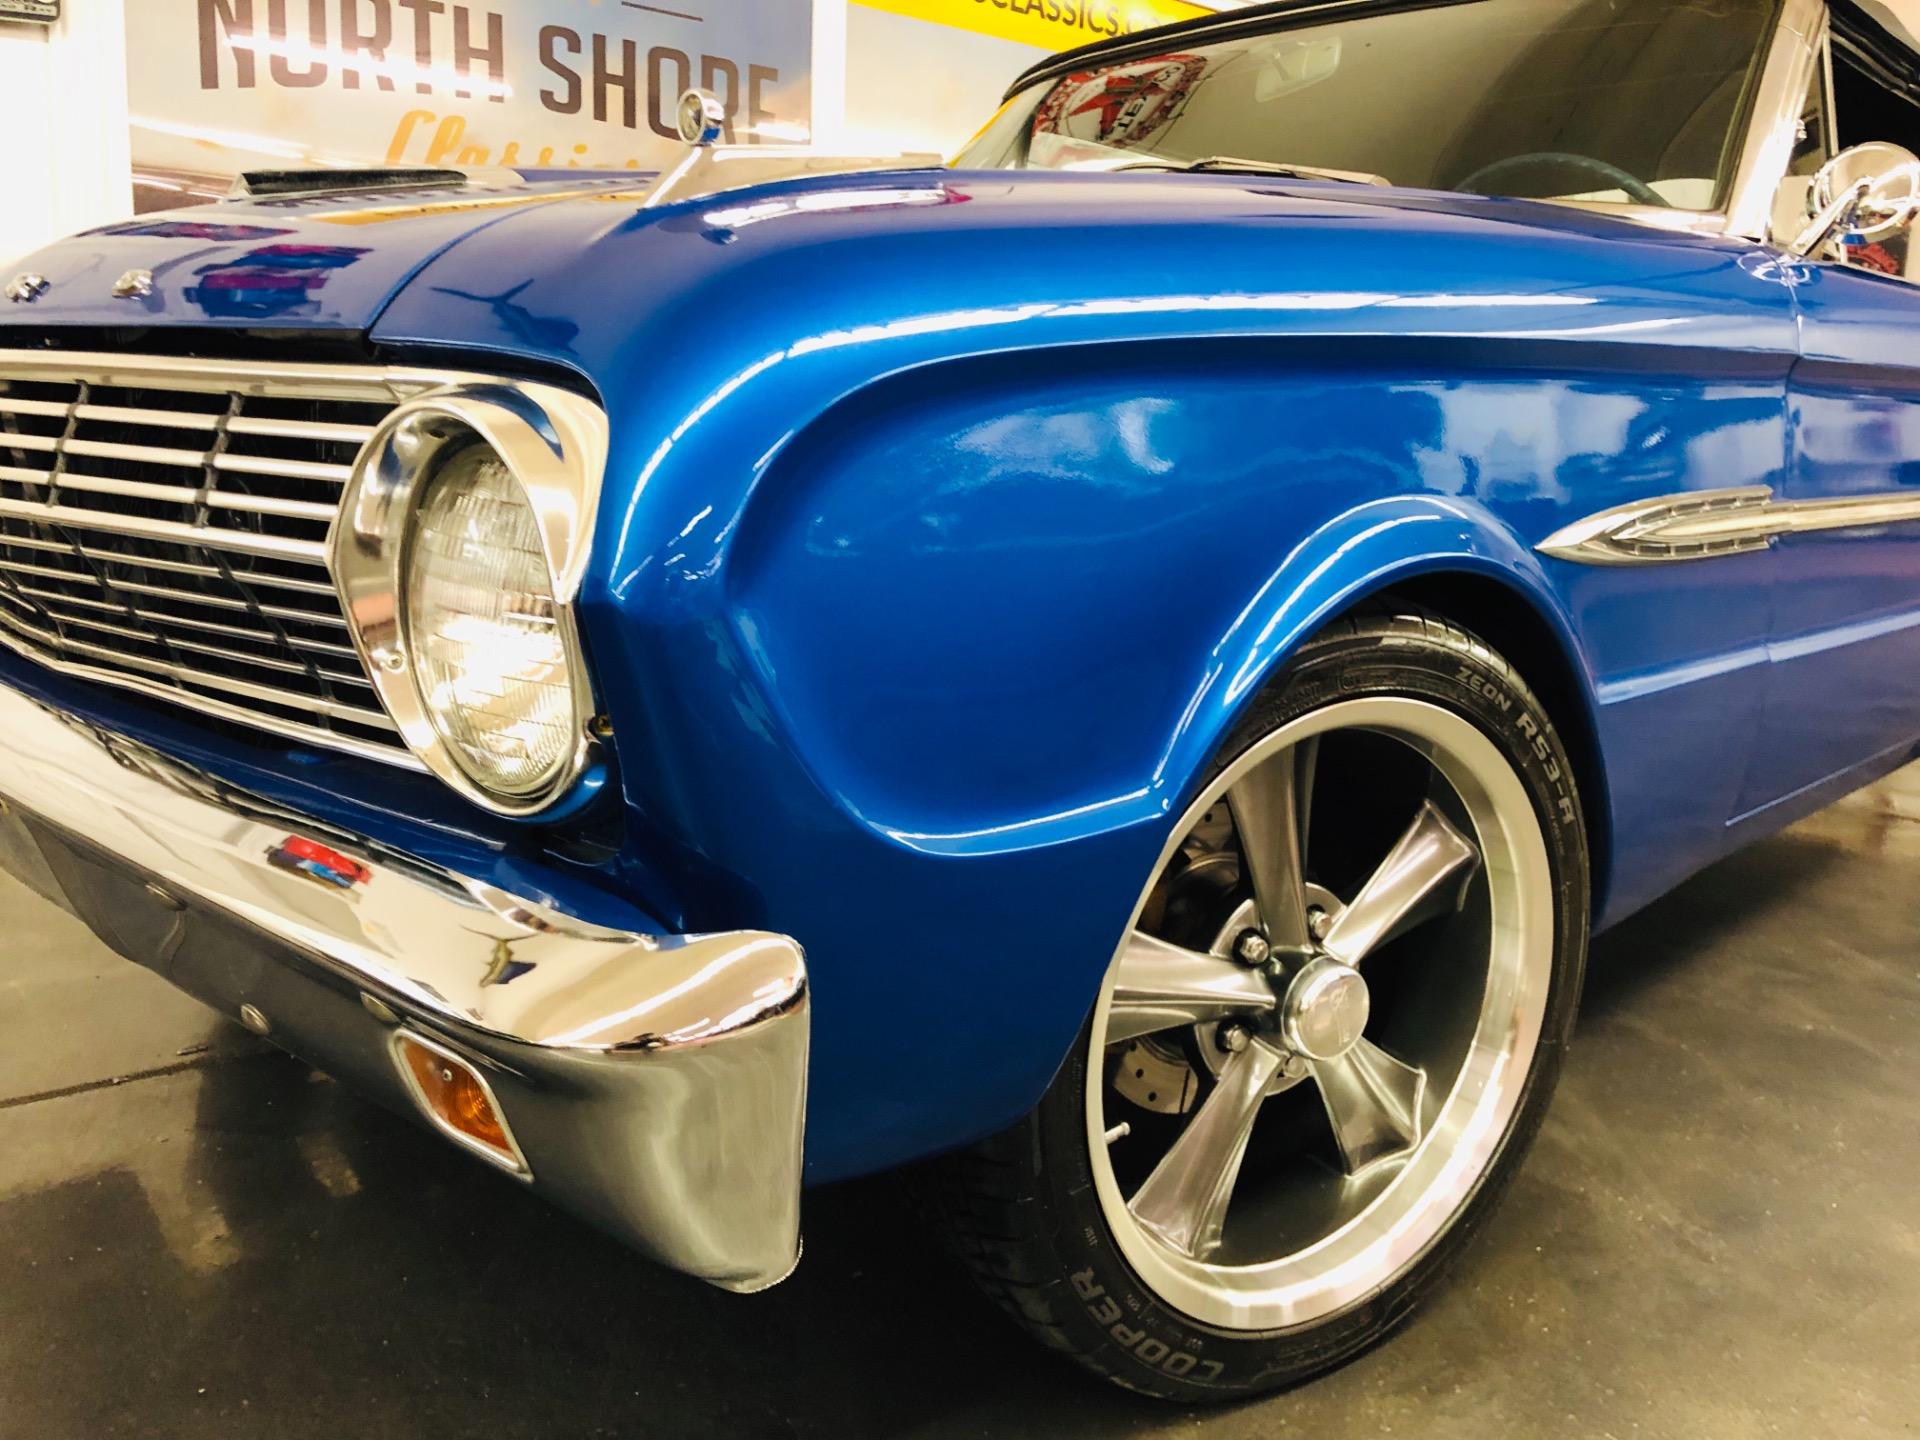 Used 1963 Ford Falcon -FUTURA-Blue Angel | Mundelein, IL